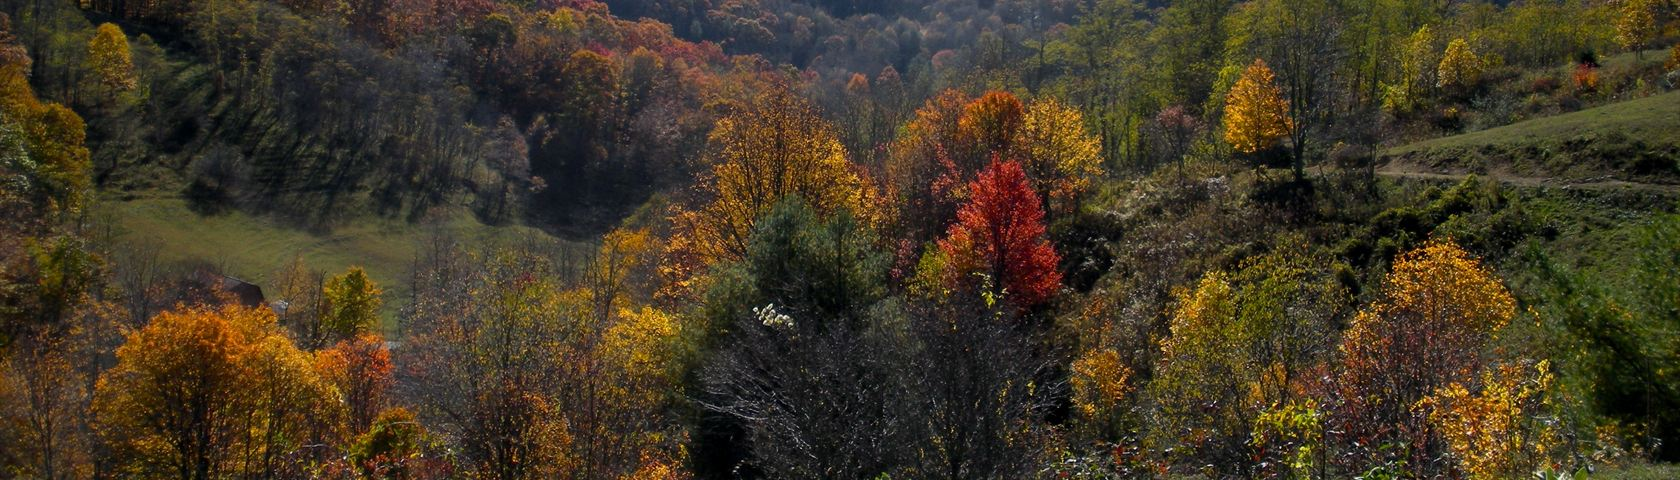 Smokey Mountains in North Carolina